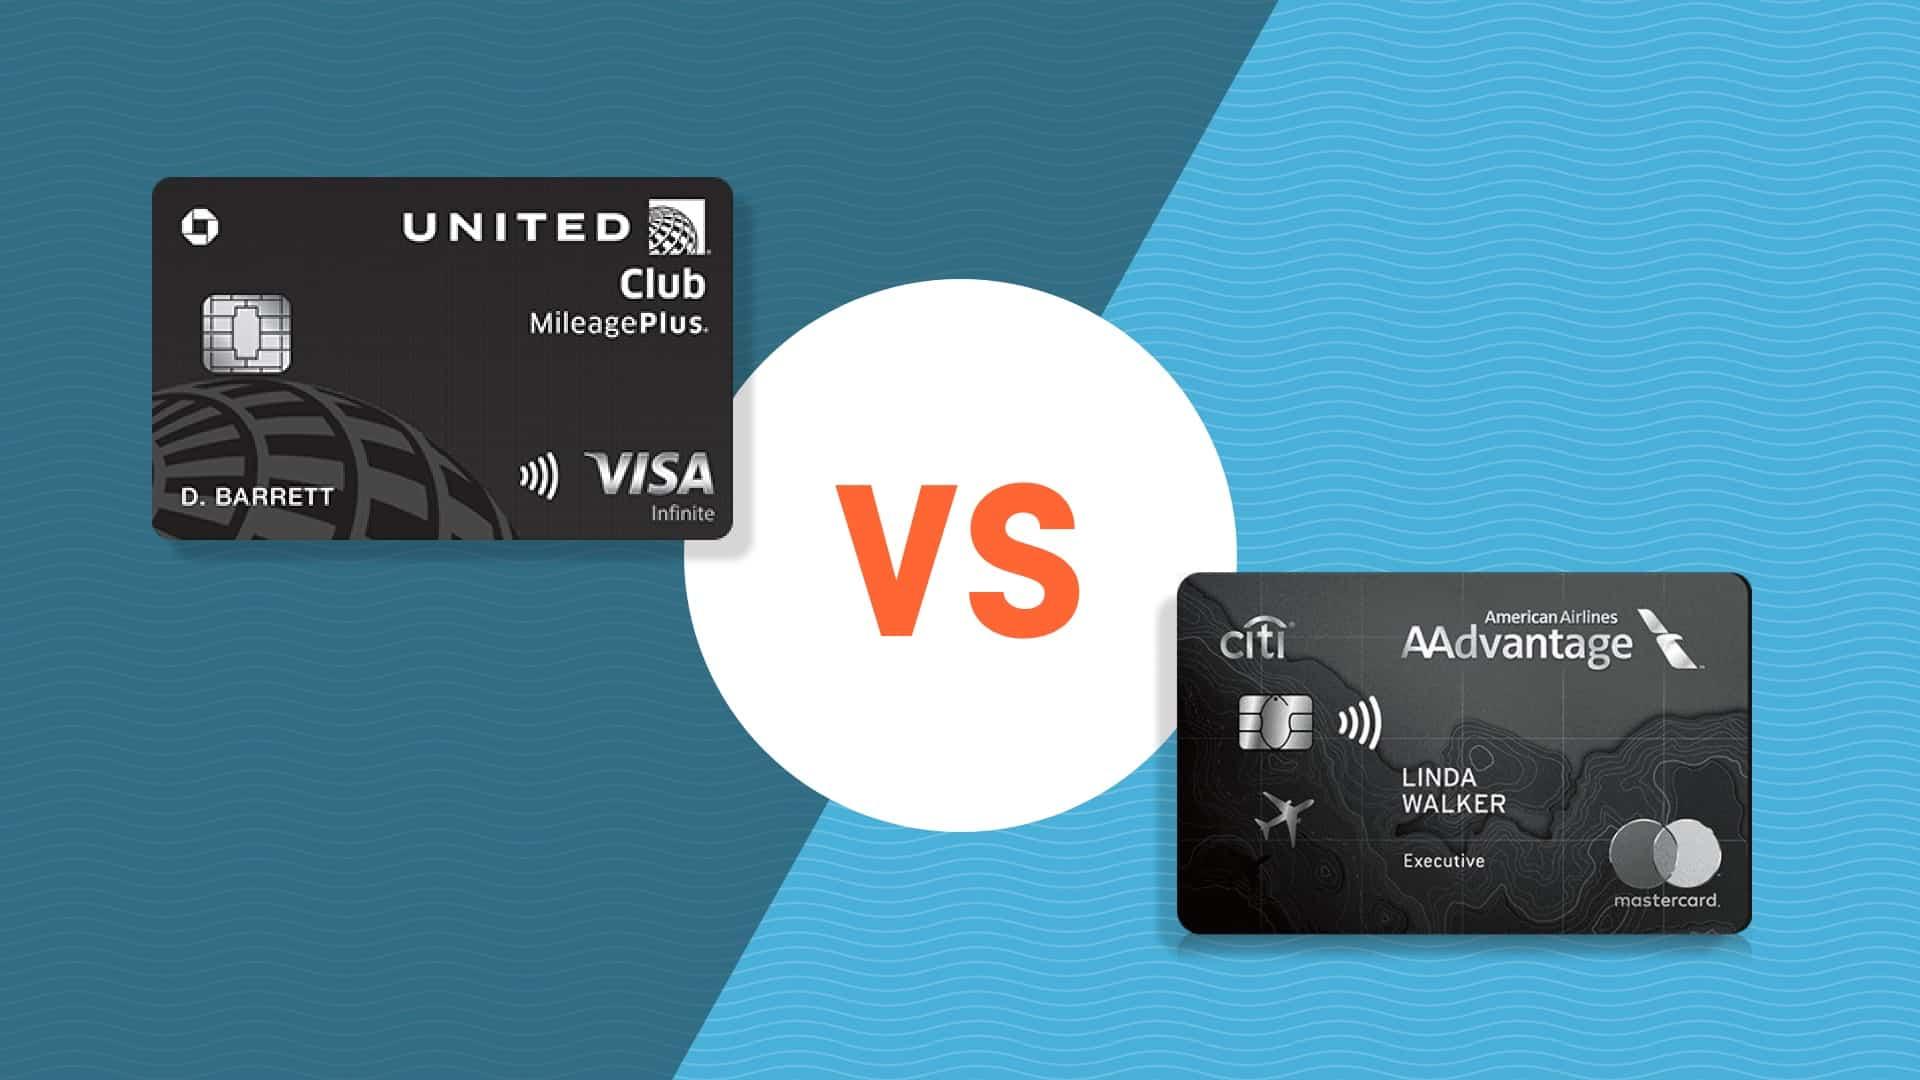 Chase United Club℠ Infinite Card vs Citi AAdvantage Executive World Elite Mastercard